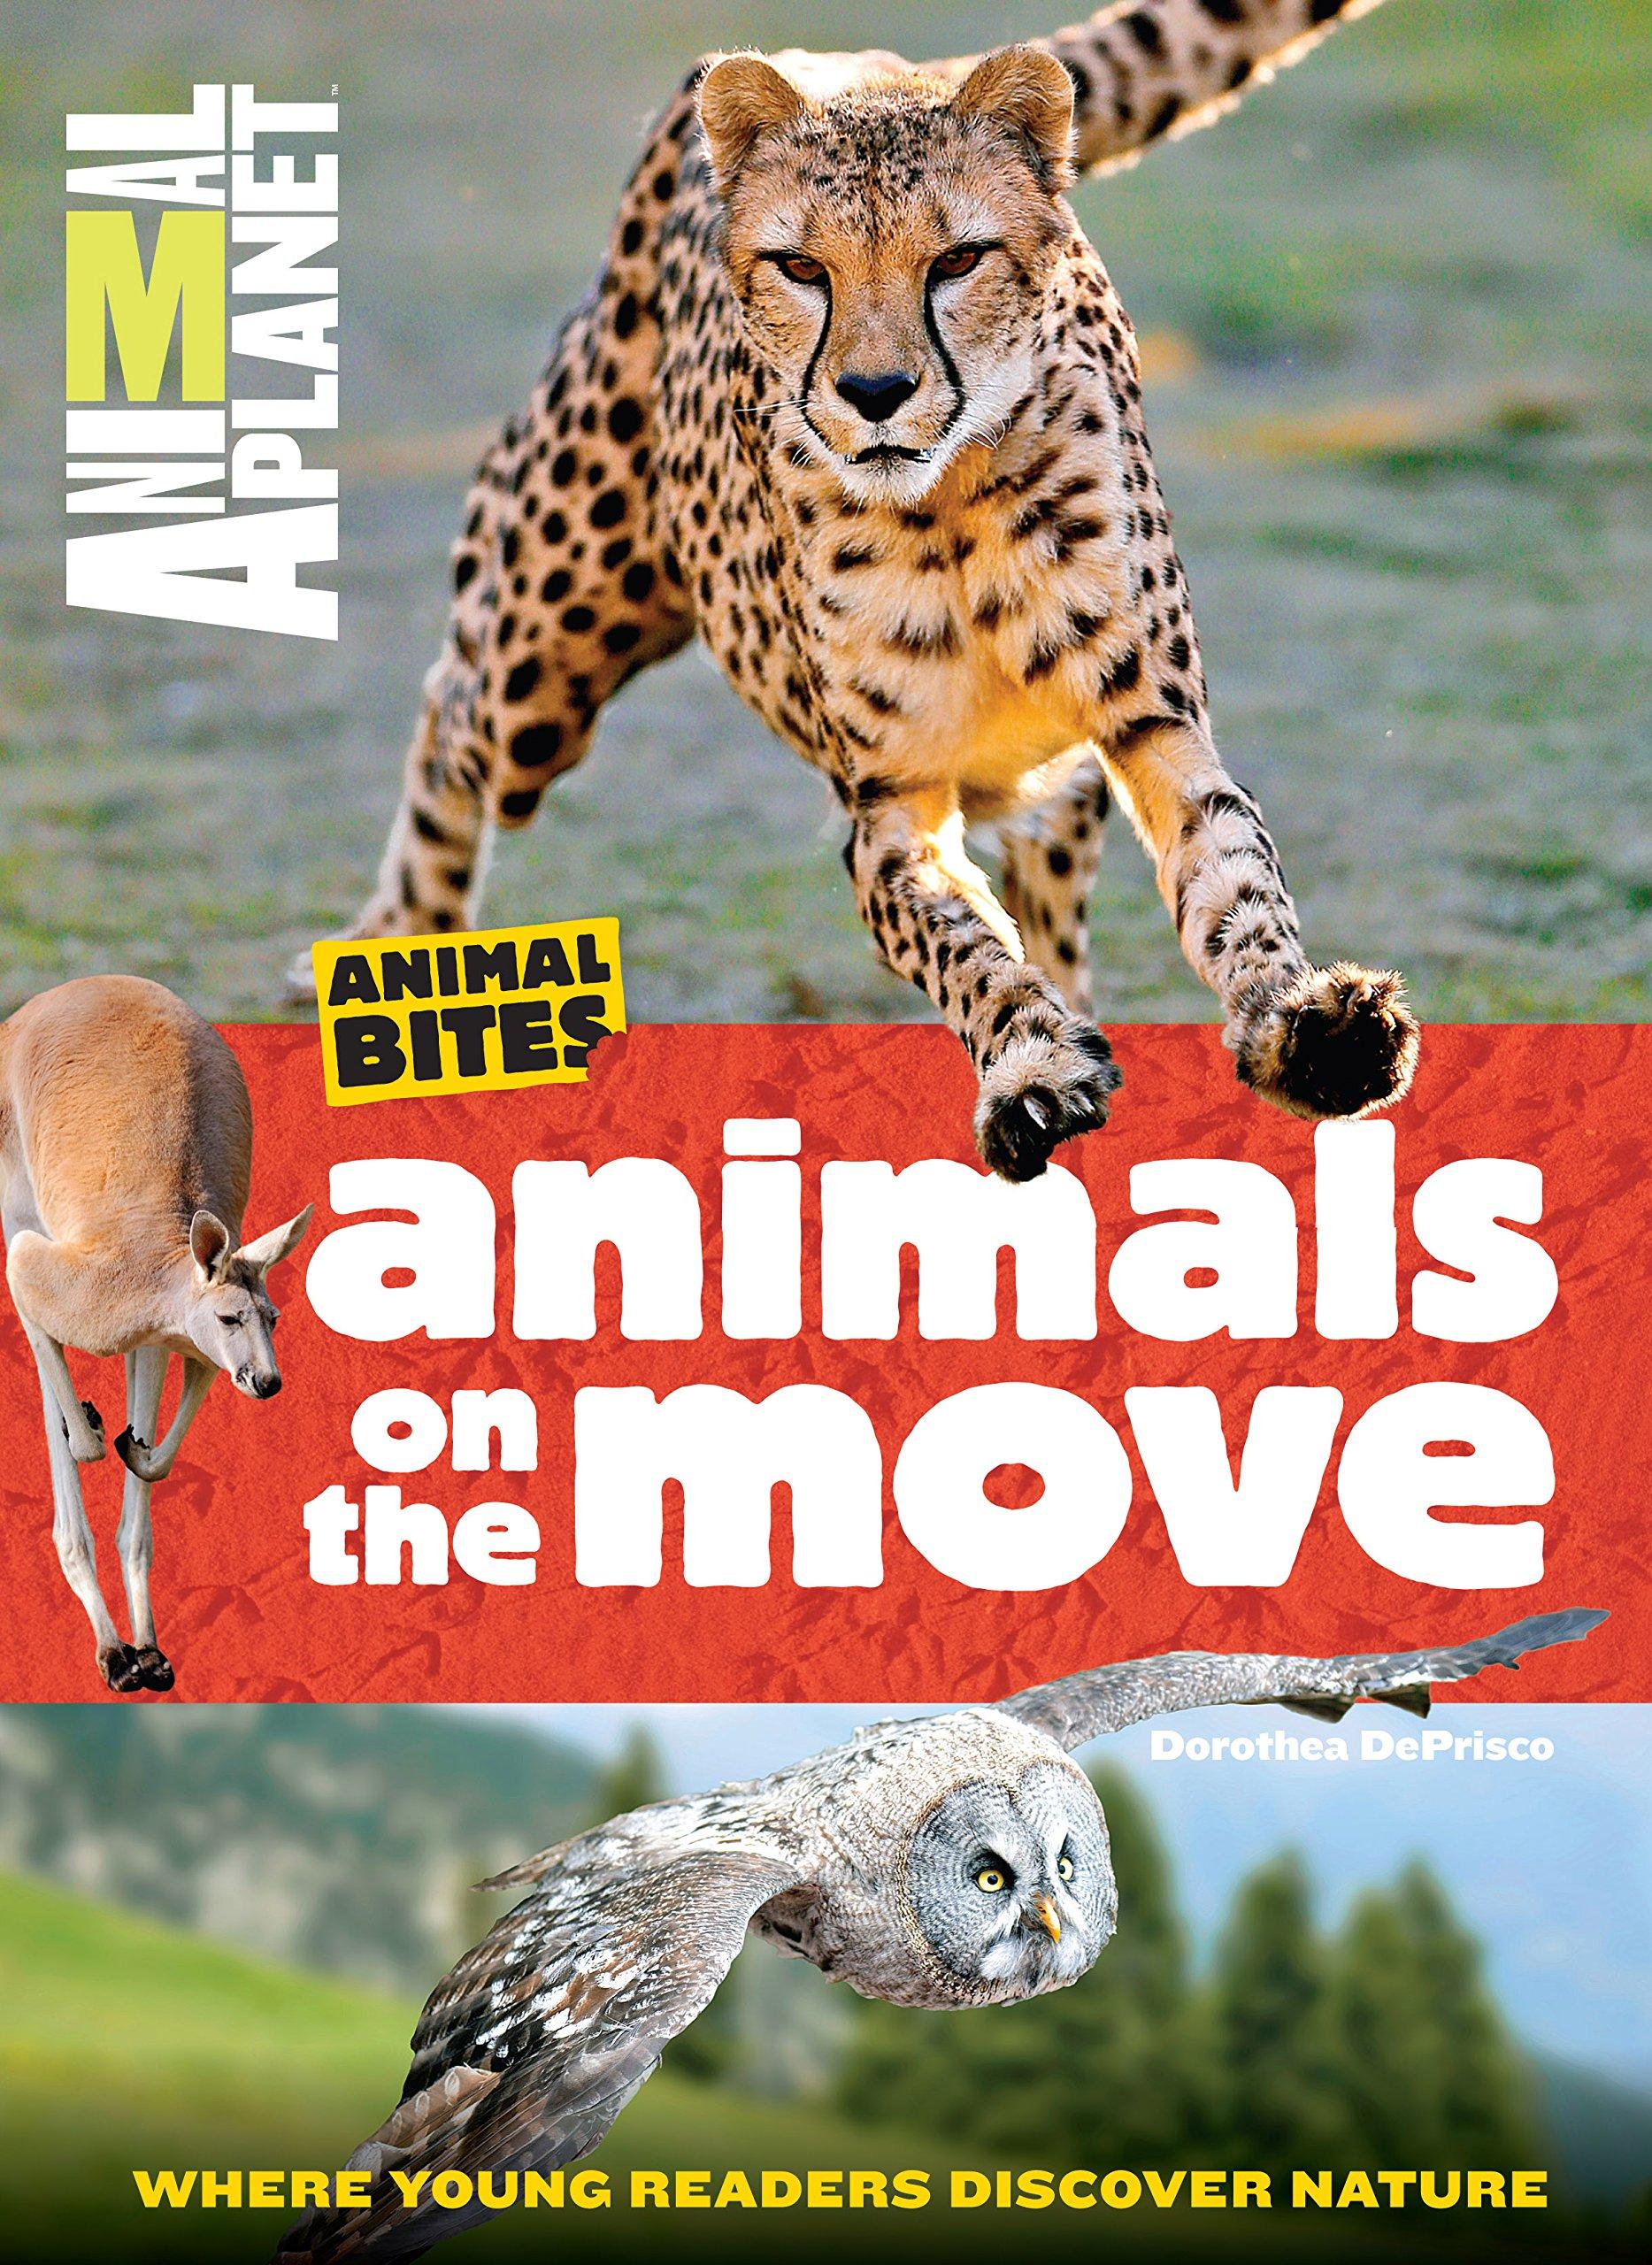 animals-on-the-move-animal-planet-animal-bites